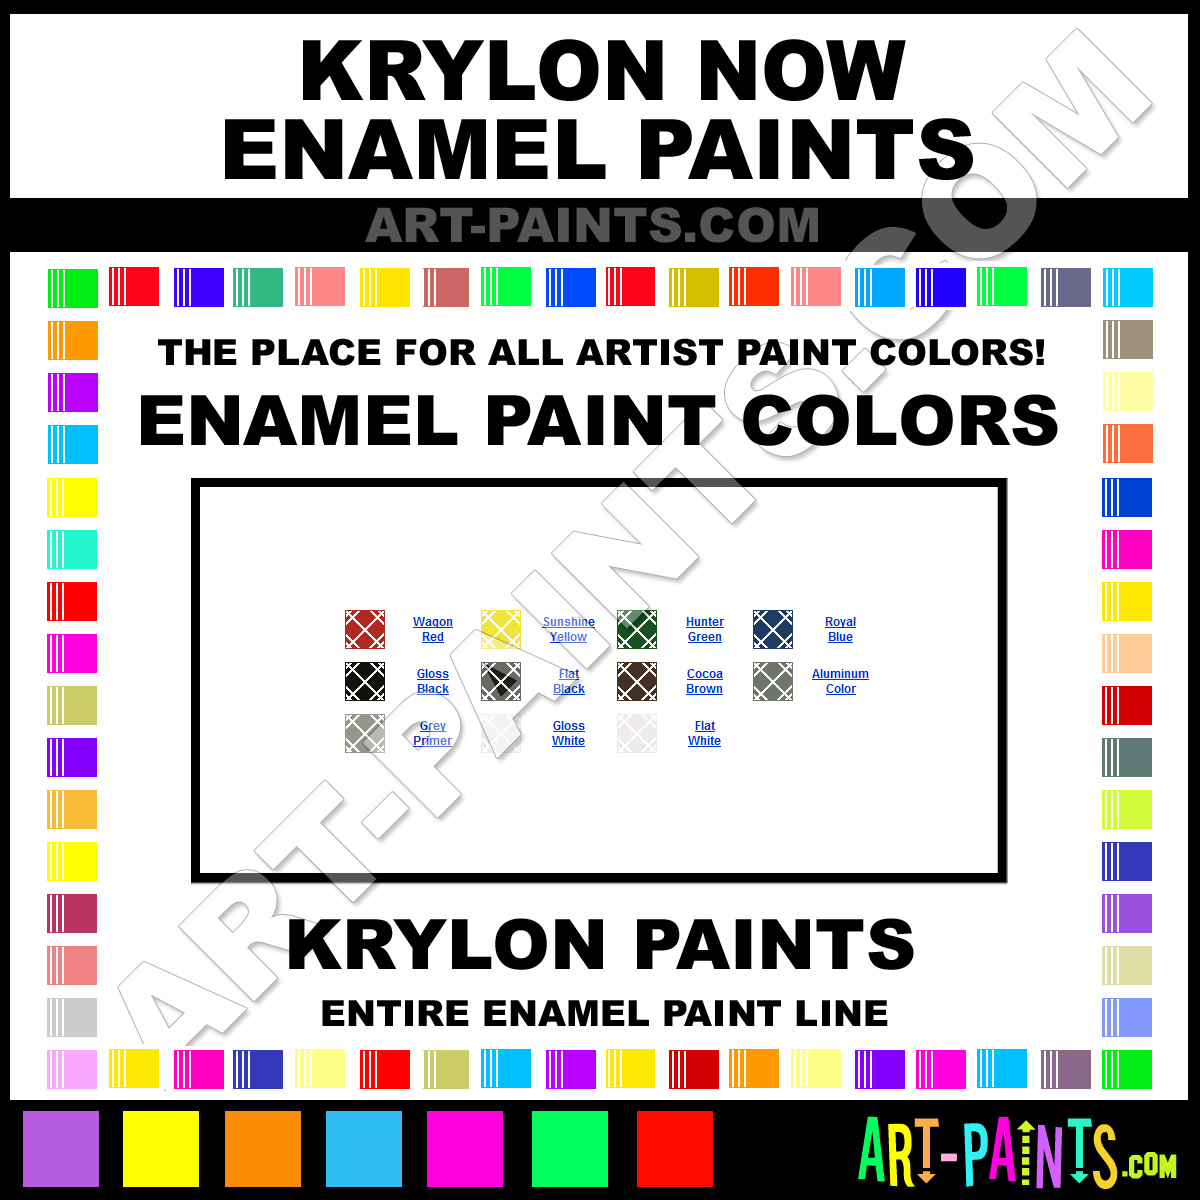 Krylon Now Enamel Paint Colors Krylon Now Paint Colors Now Color Now Enamels Krylon Now